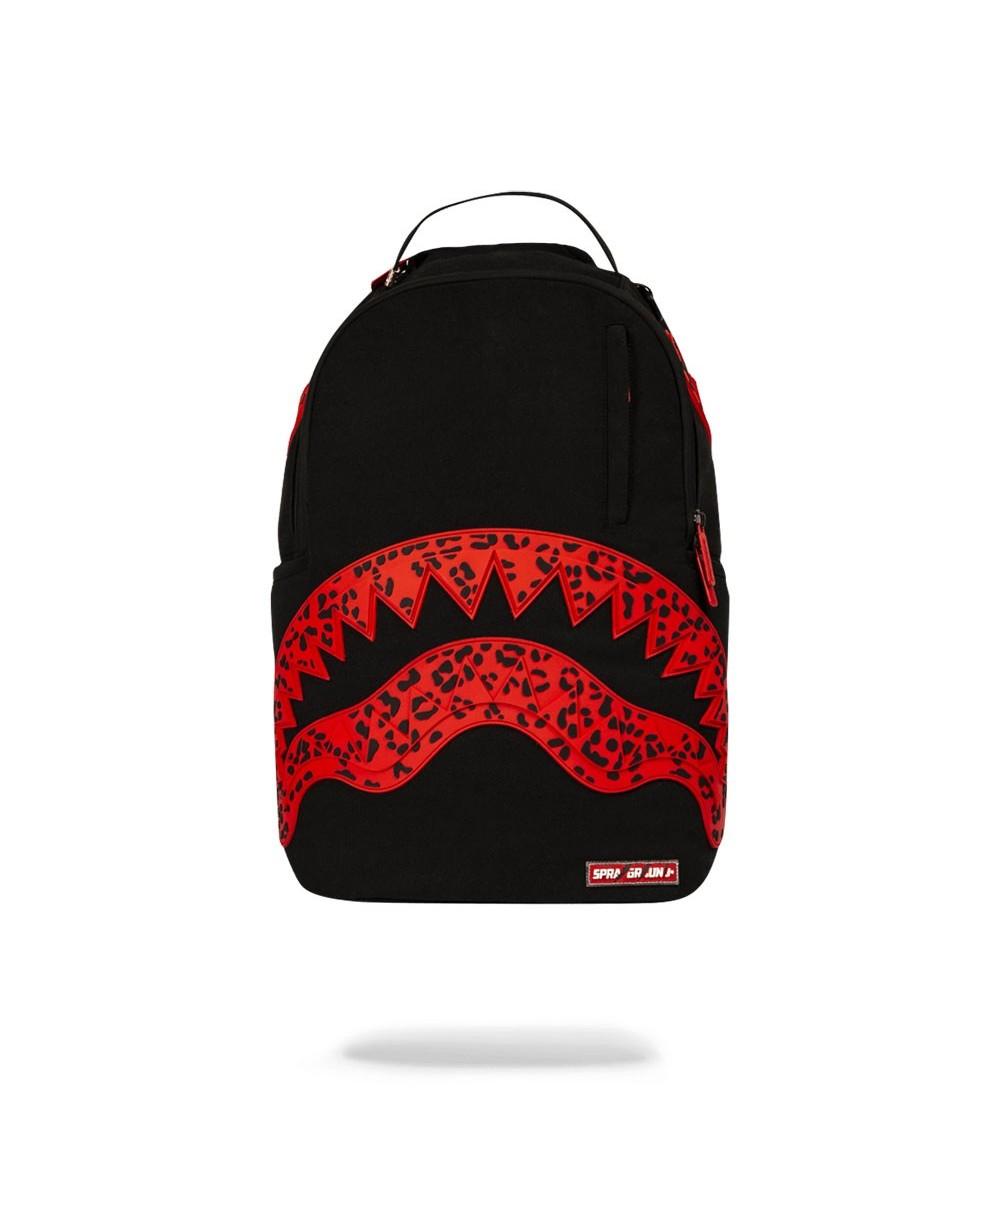 2d0eb481aff Sprayground Red Leopard Rubber Shark Backpack